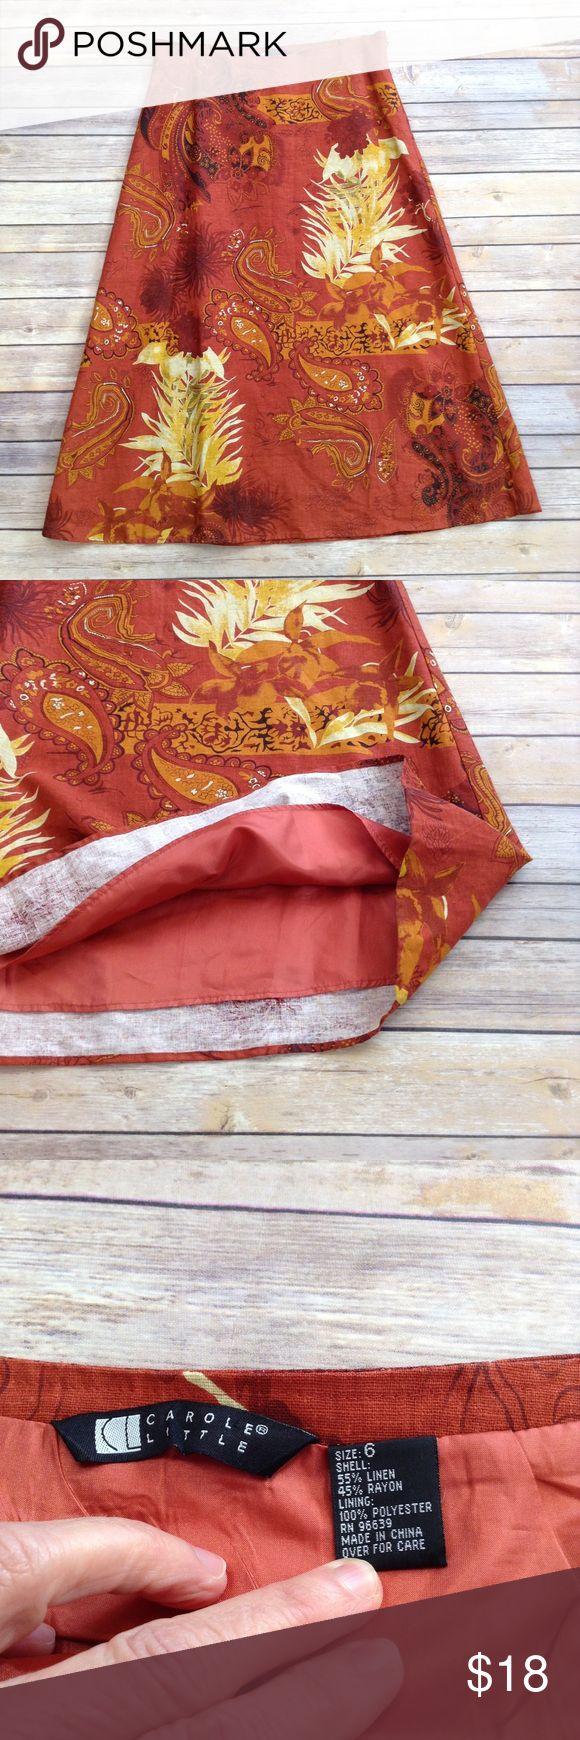 "Carole Little burnt orange maxi skirt Absolutely no flaws! Vibrant fall colors!  APPROX FLAT MEASUREMENTS  32"" ↕️ 16"" ↔️ waist 30"" ↔️ hemline Carole Little Skirts Maxi"